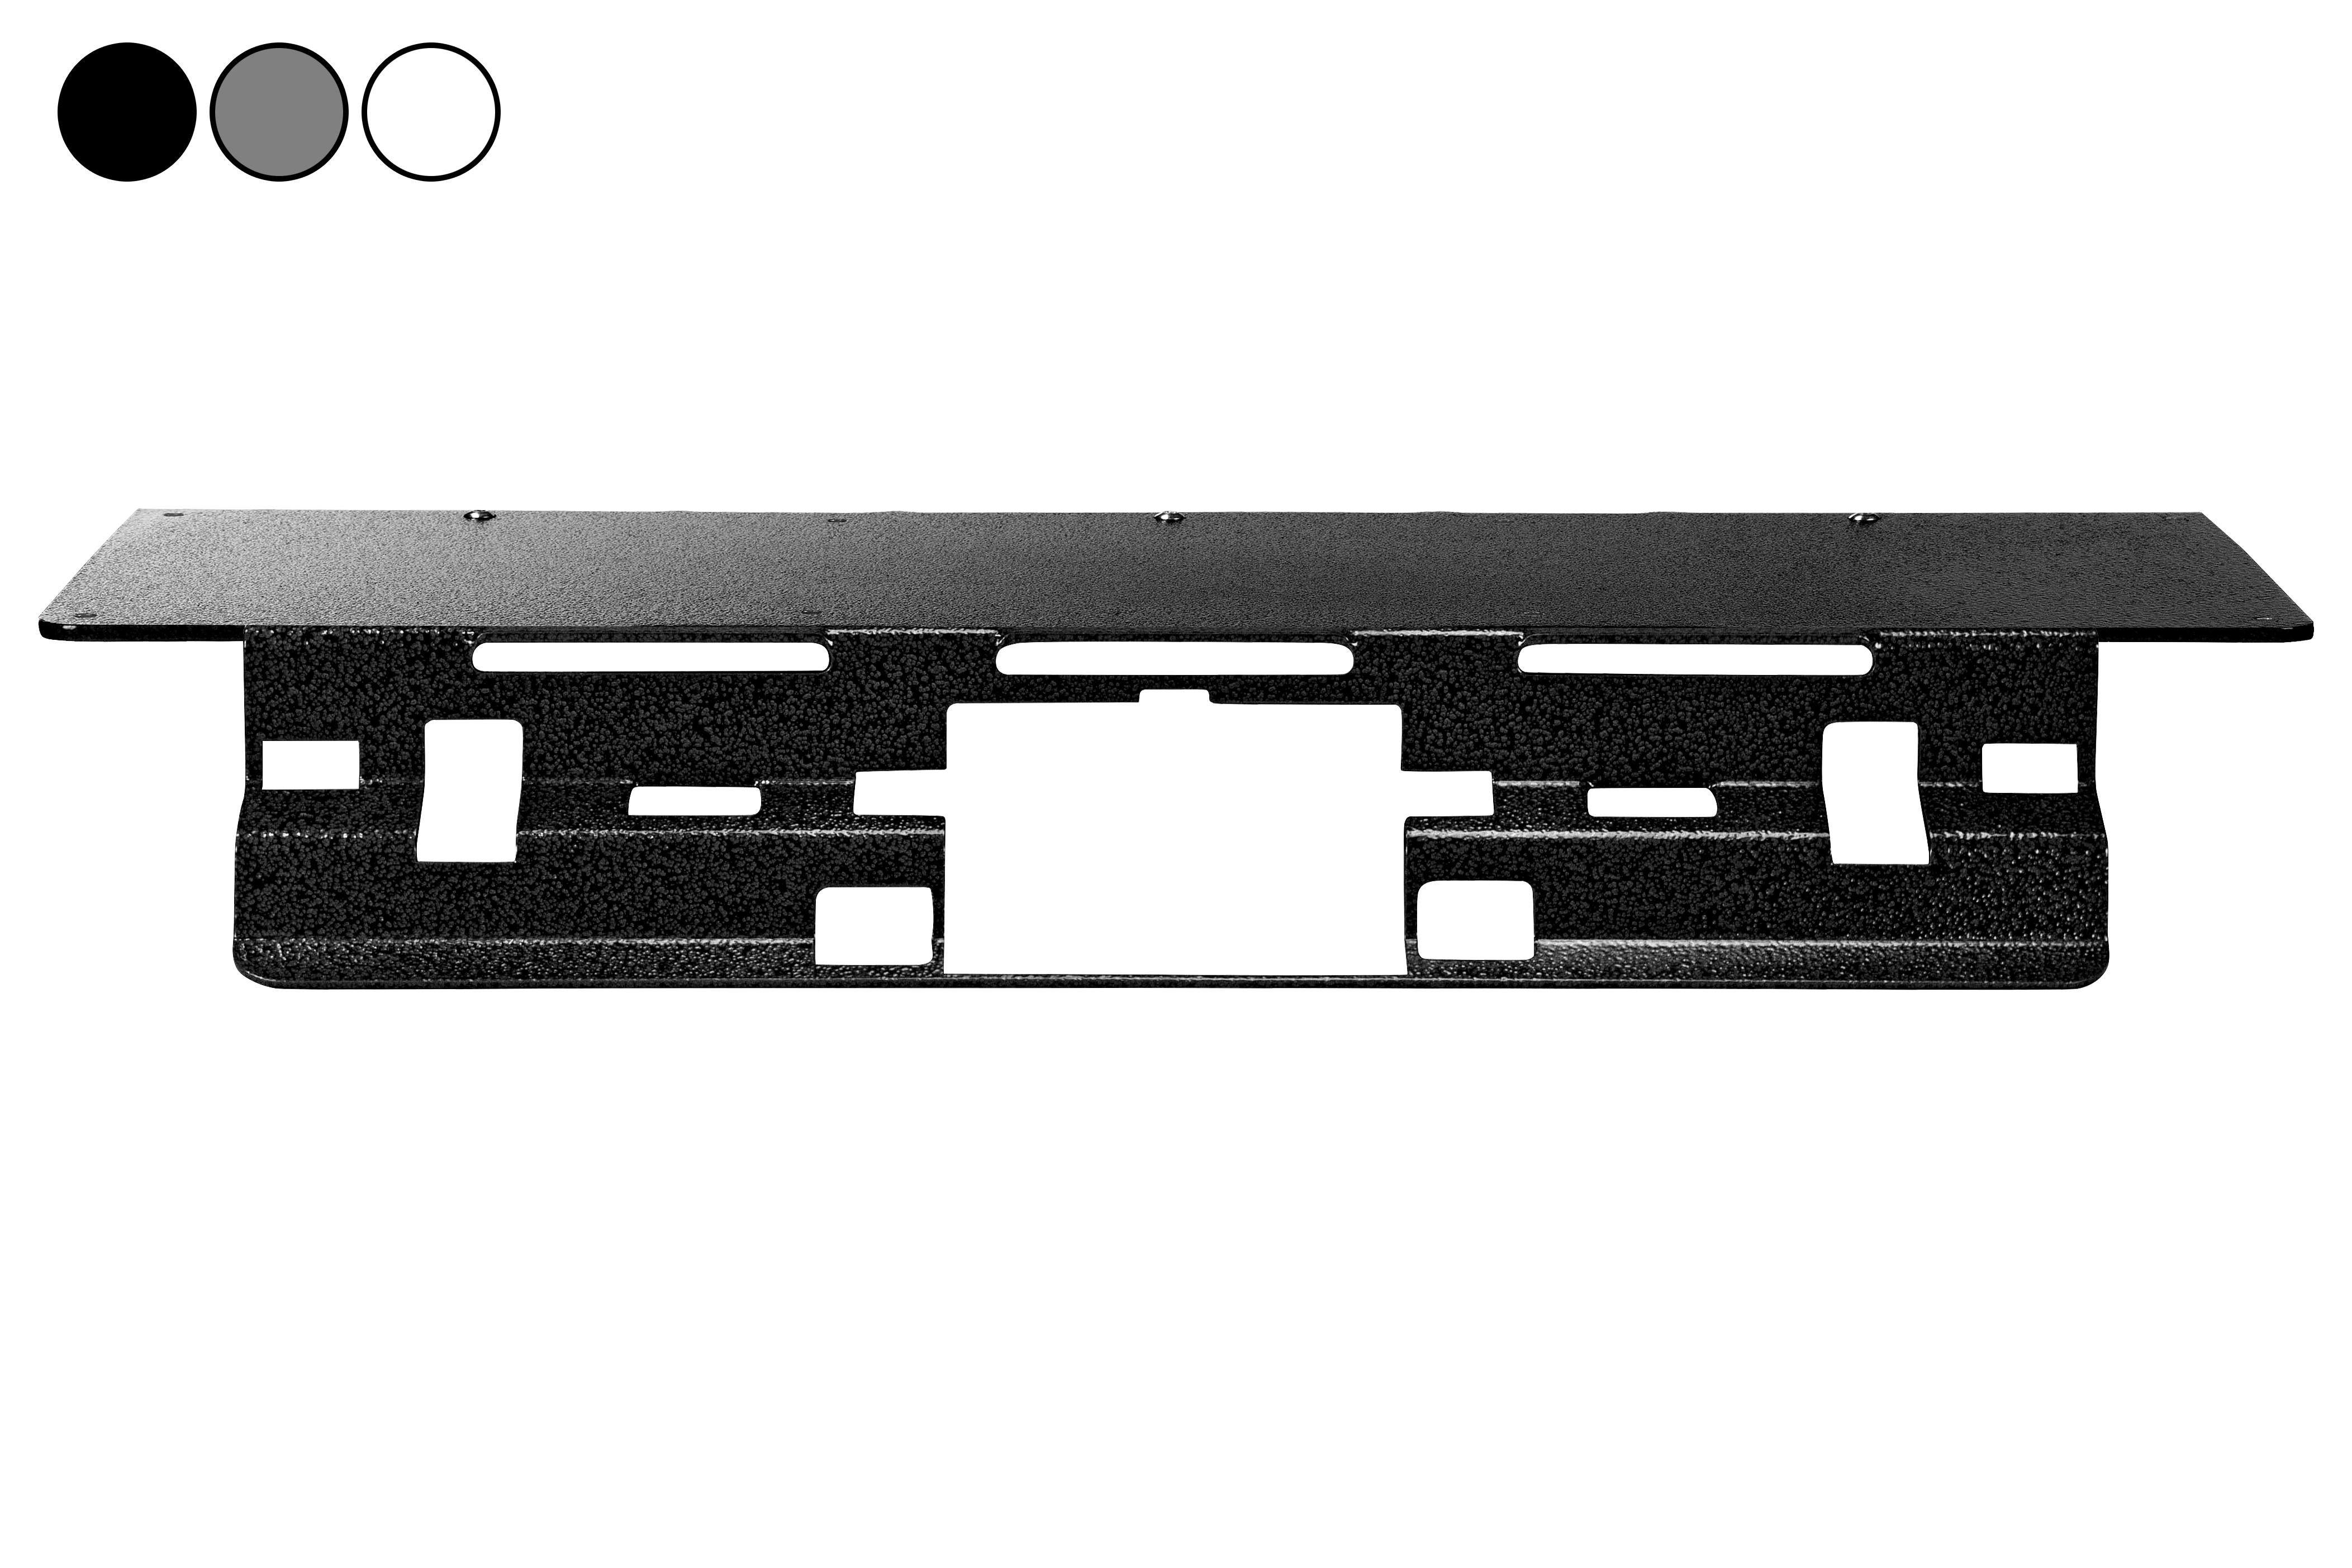 No Drill Mounting Plate, Fits 2020 Chevrolet Silverado 1500HD w/ Spoiler, Permanent